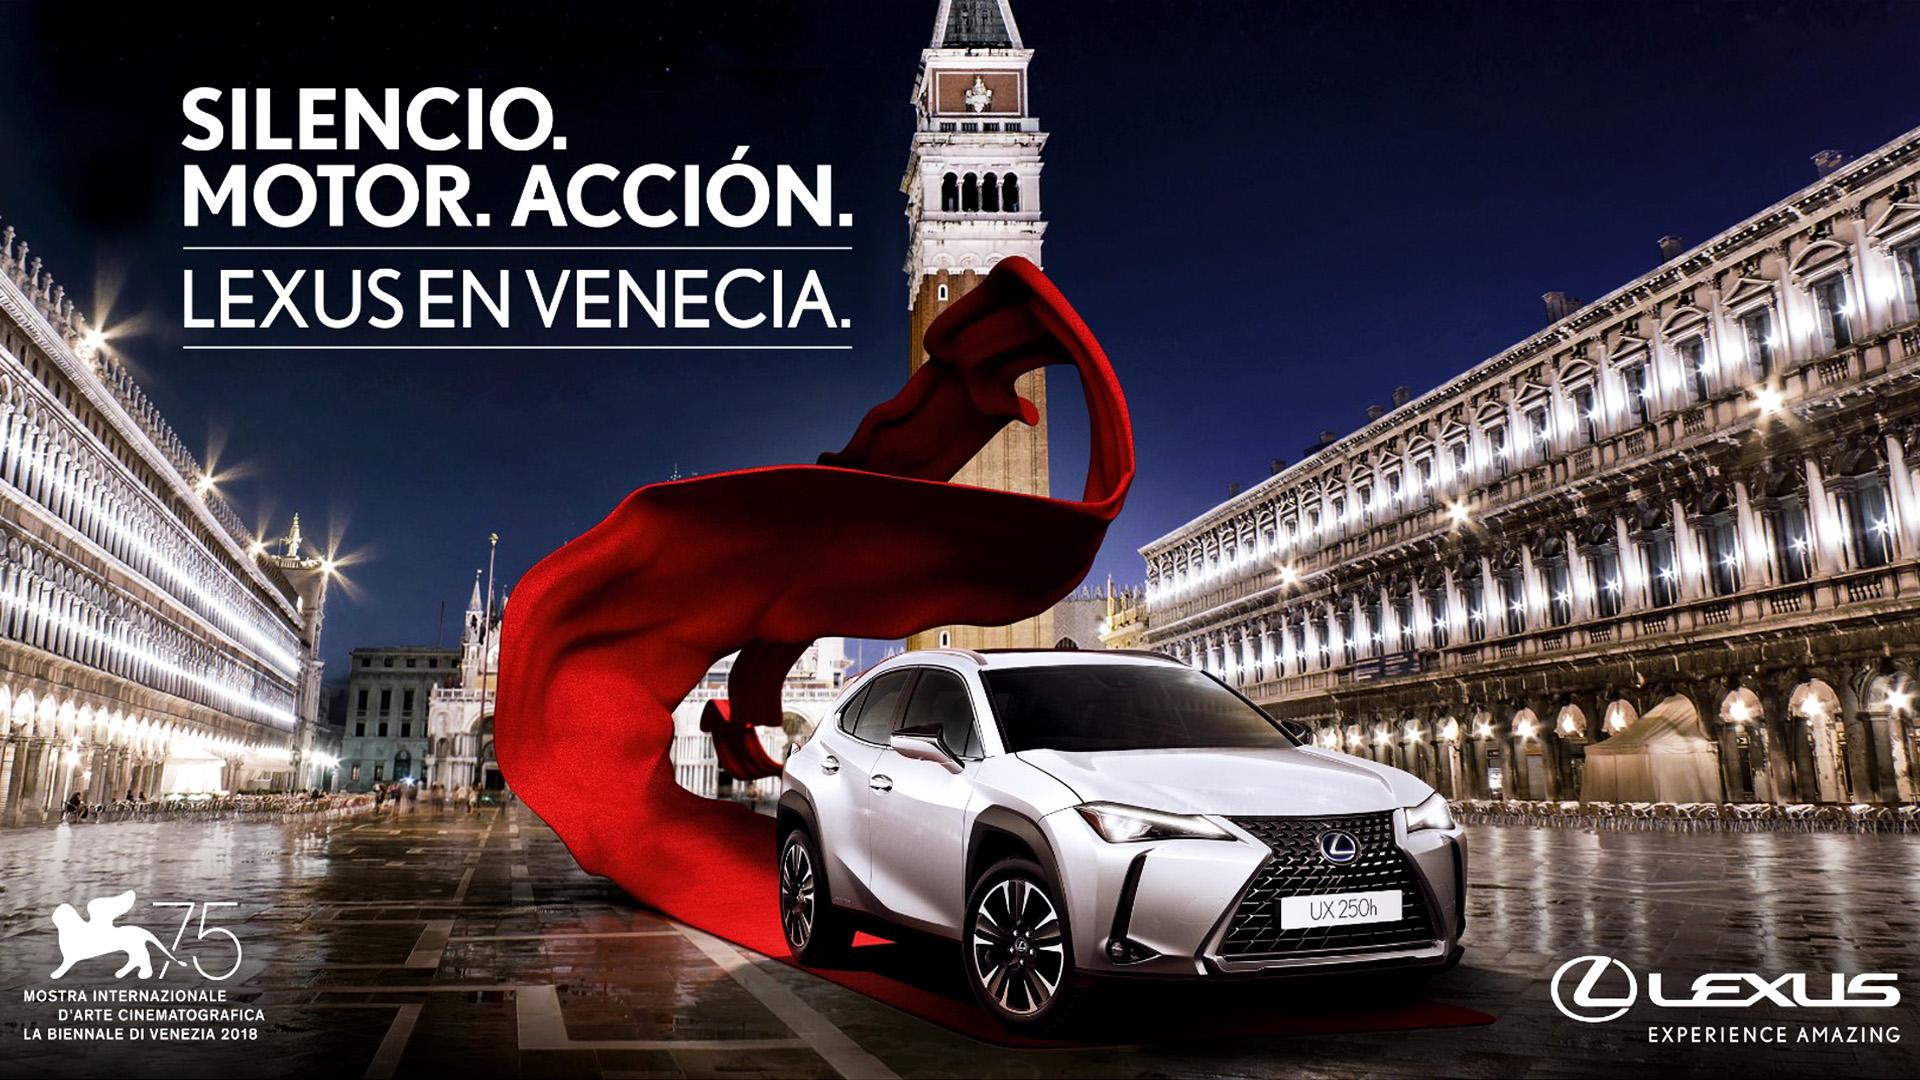 Lexus Festival Venecia 2018 hero asset